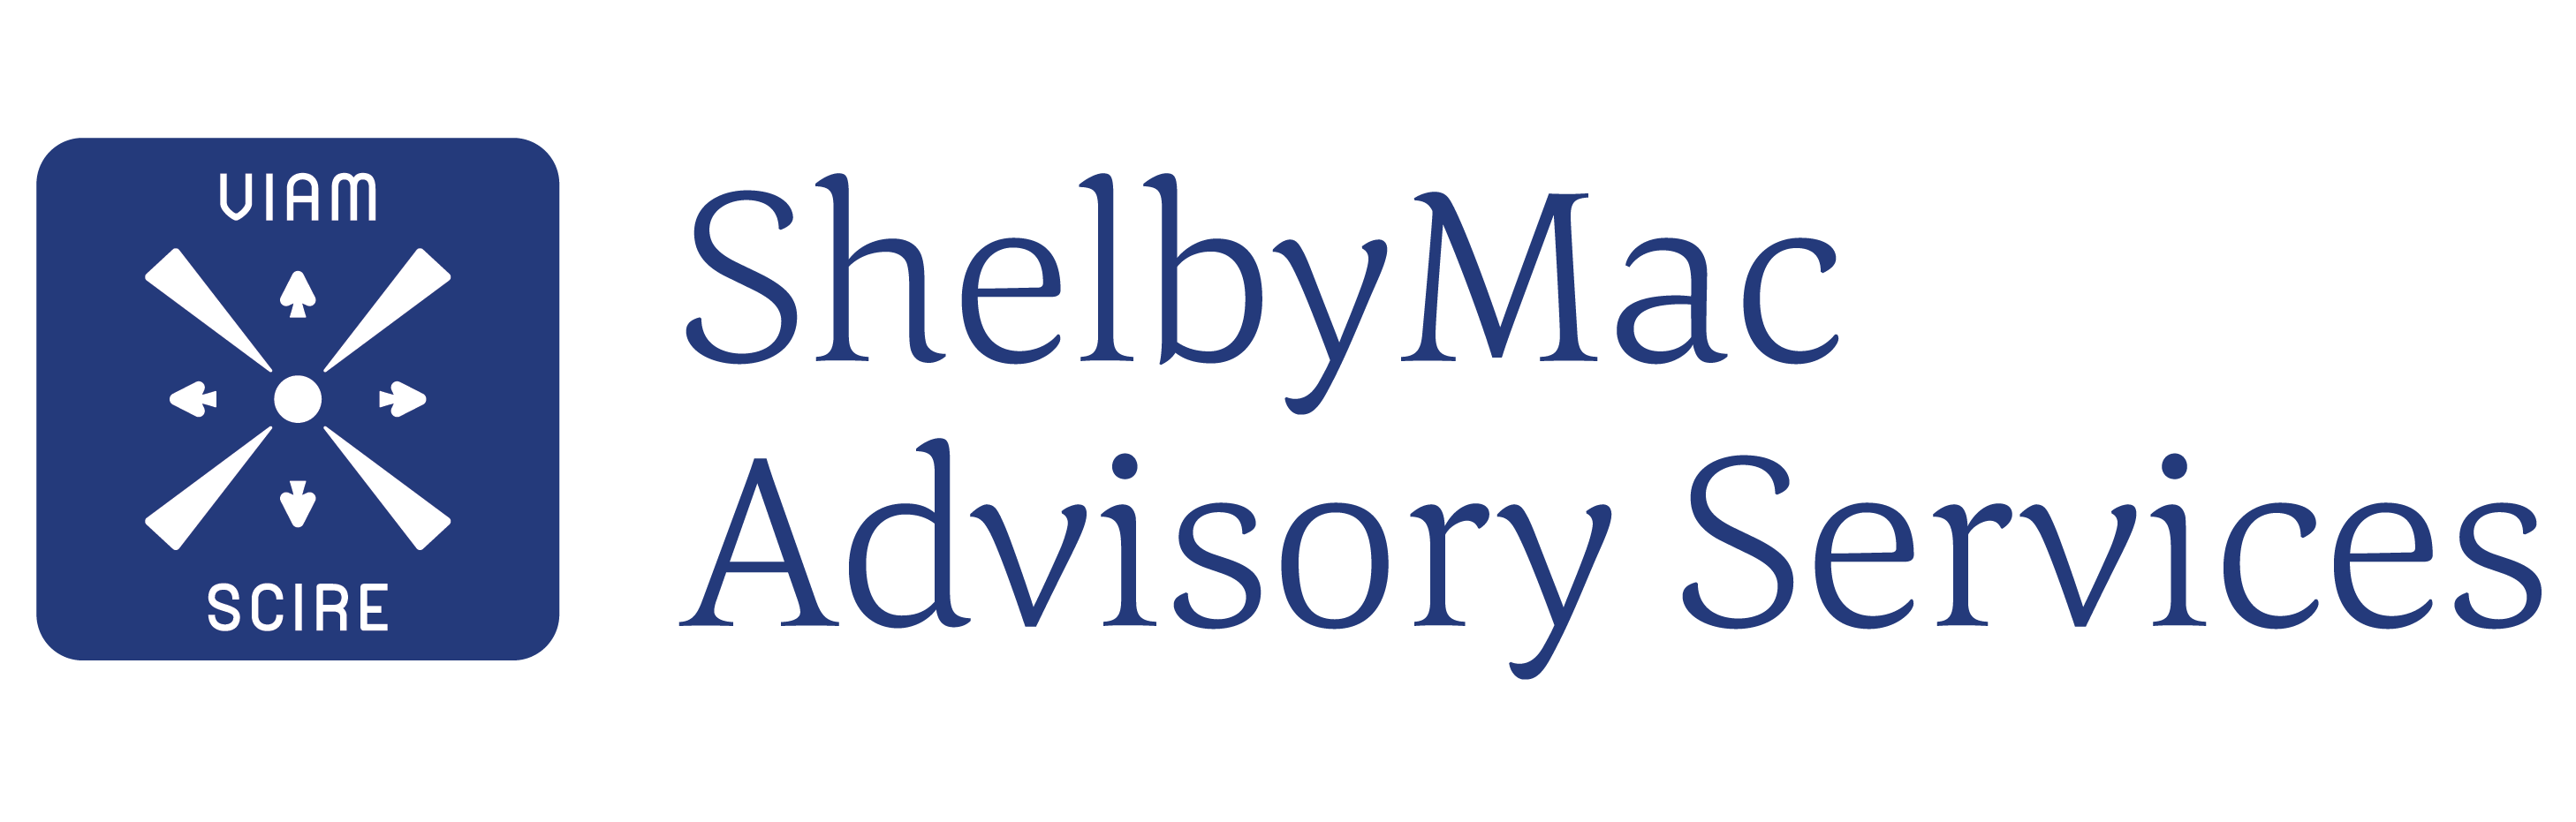 ShelbyMac Advisory Services